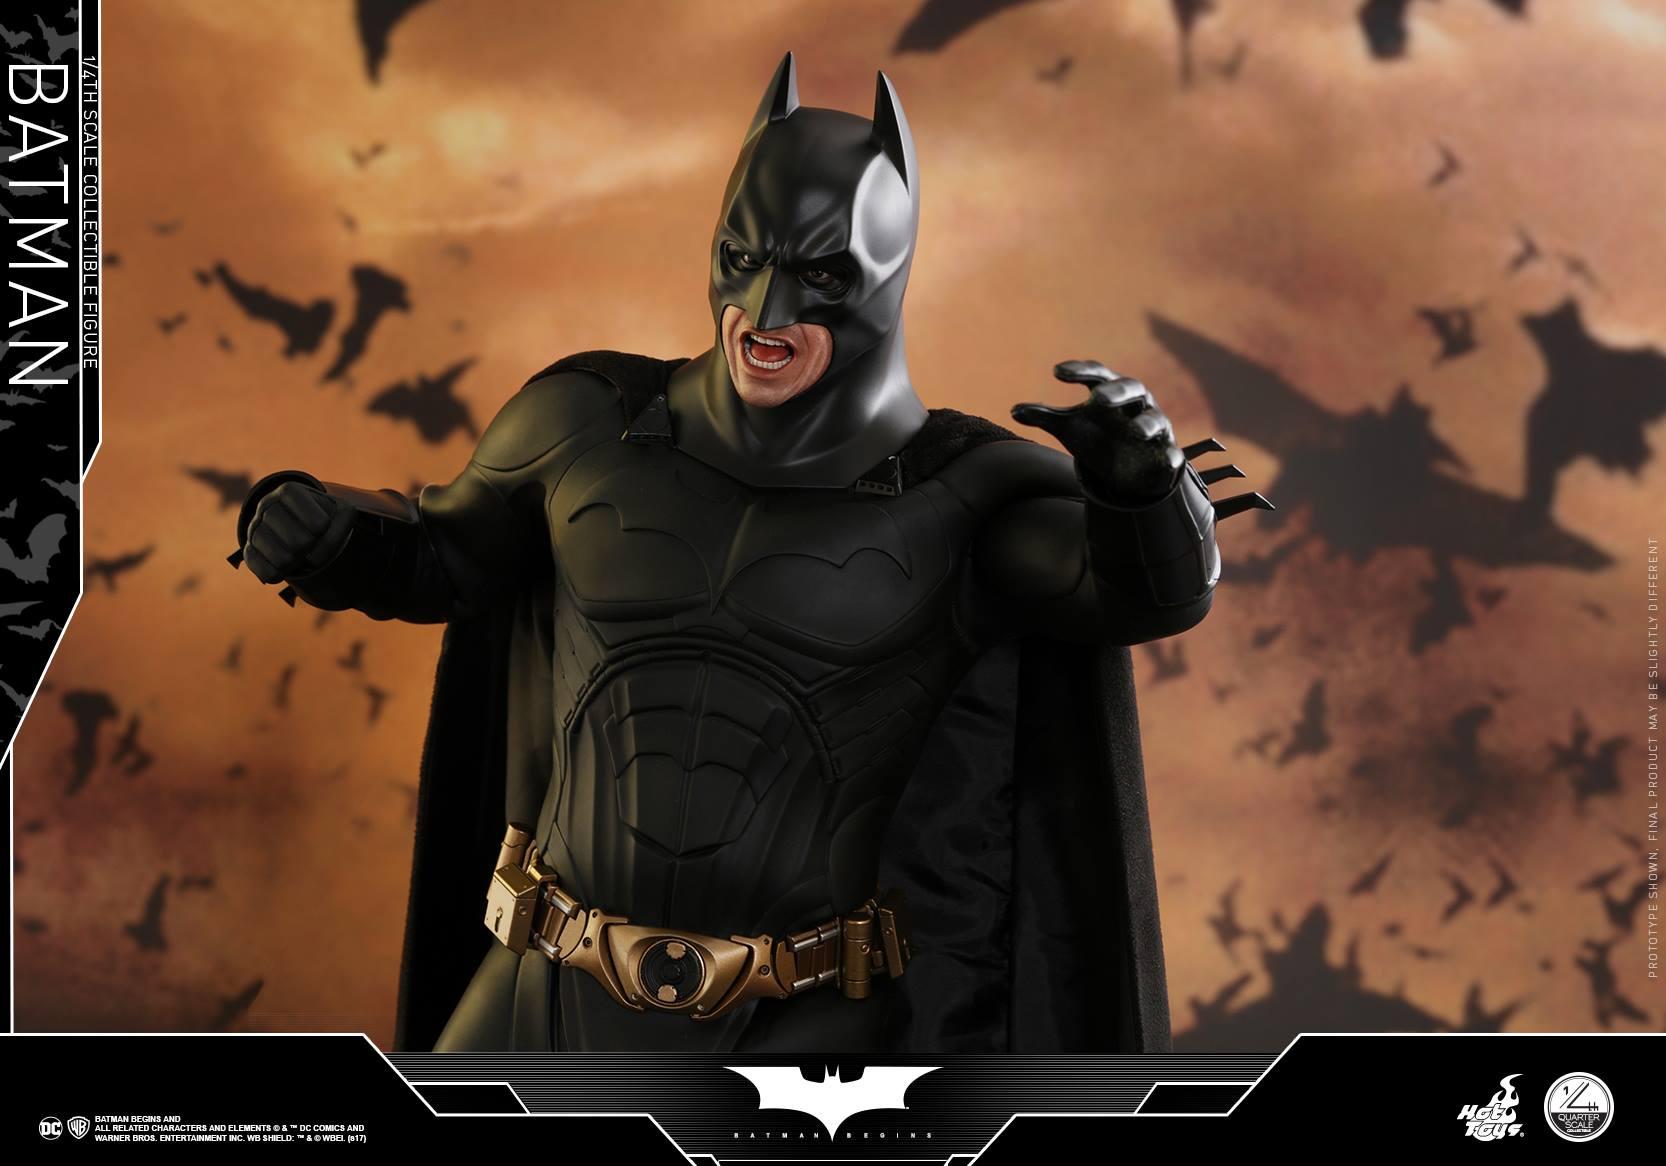 Hot Toys Justice League Dark Knight Trilogy Batman & Joker 1/4″ Scale Figures